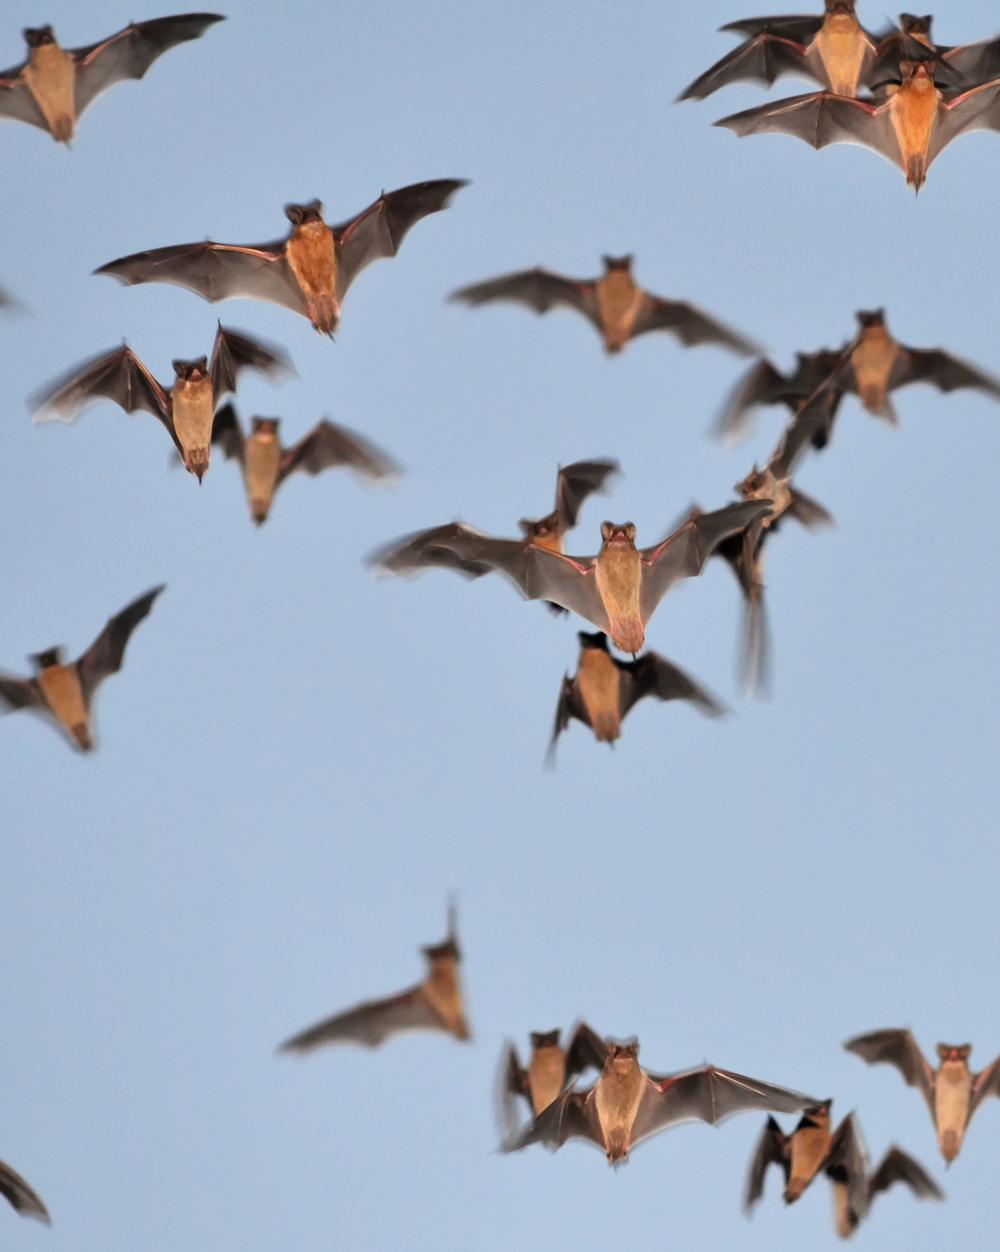 Mexican Freetail Bats